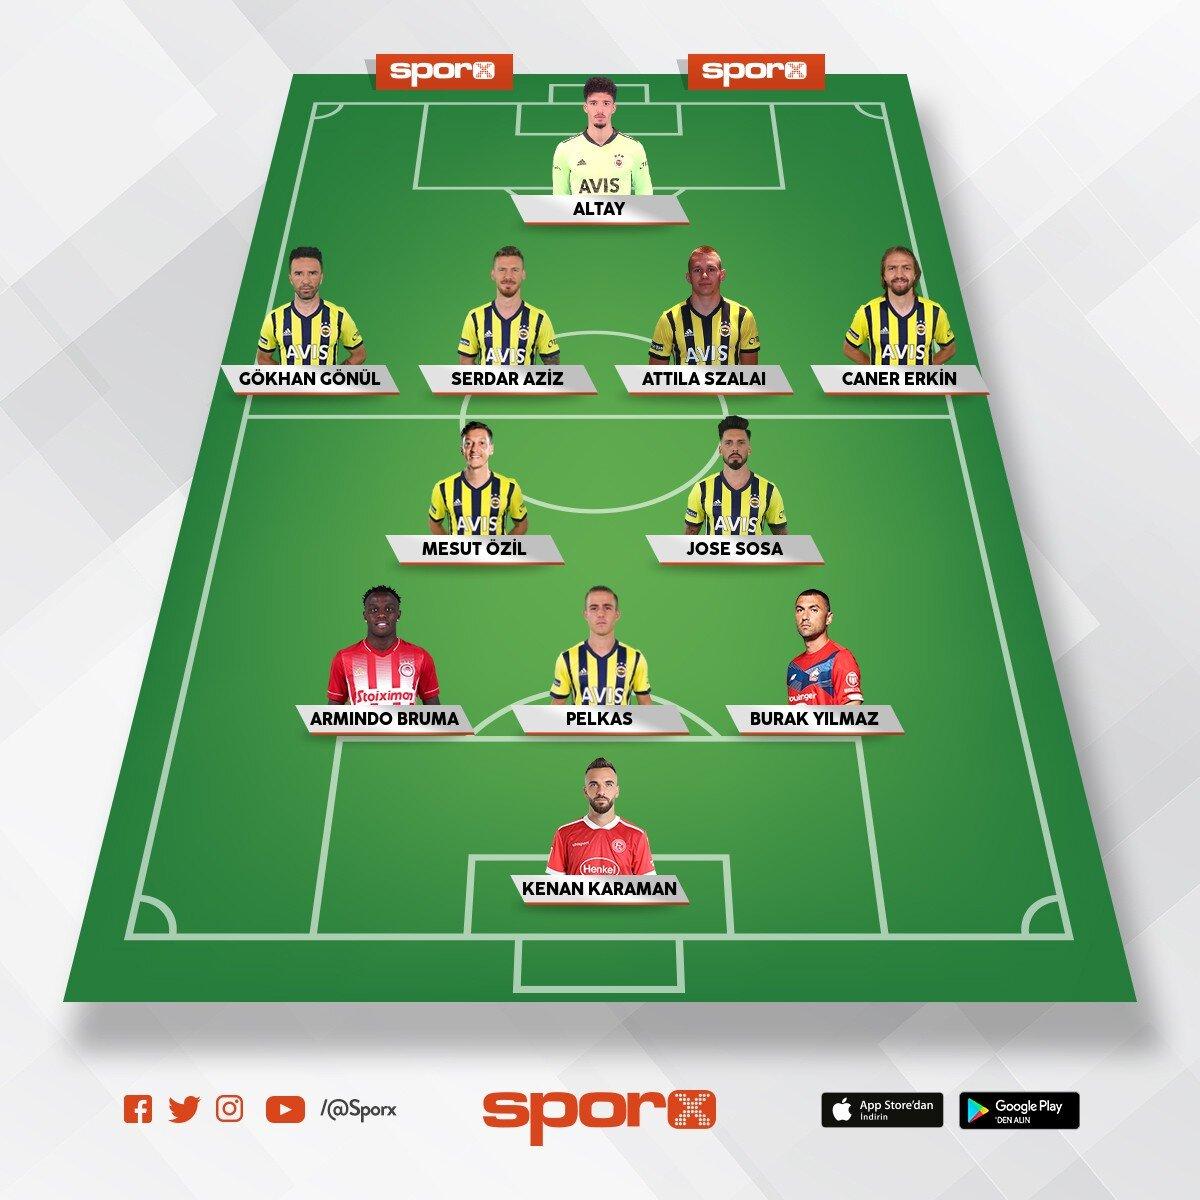 fb transfer listesindeki oyuncular part 4